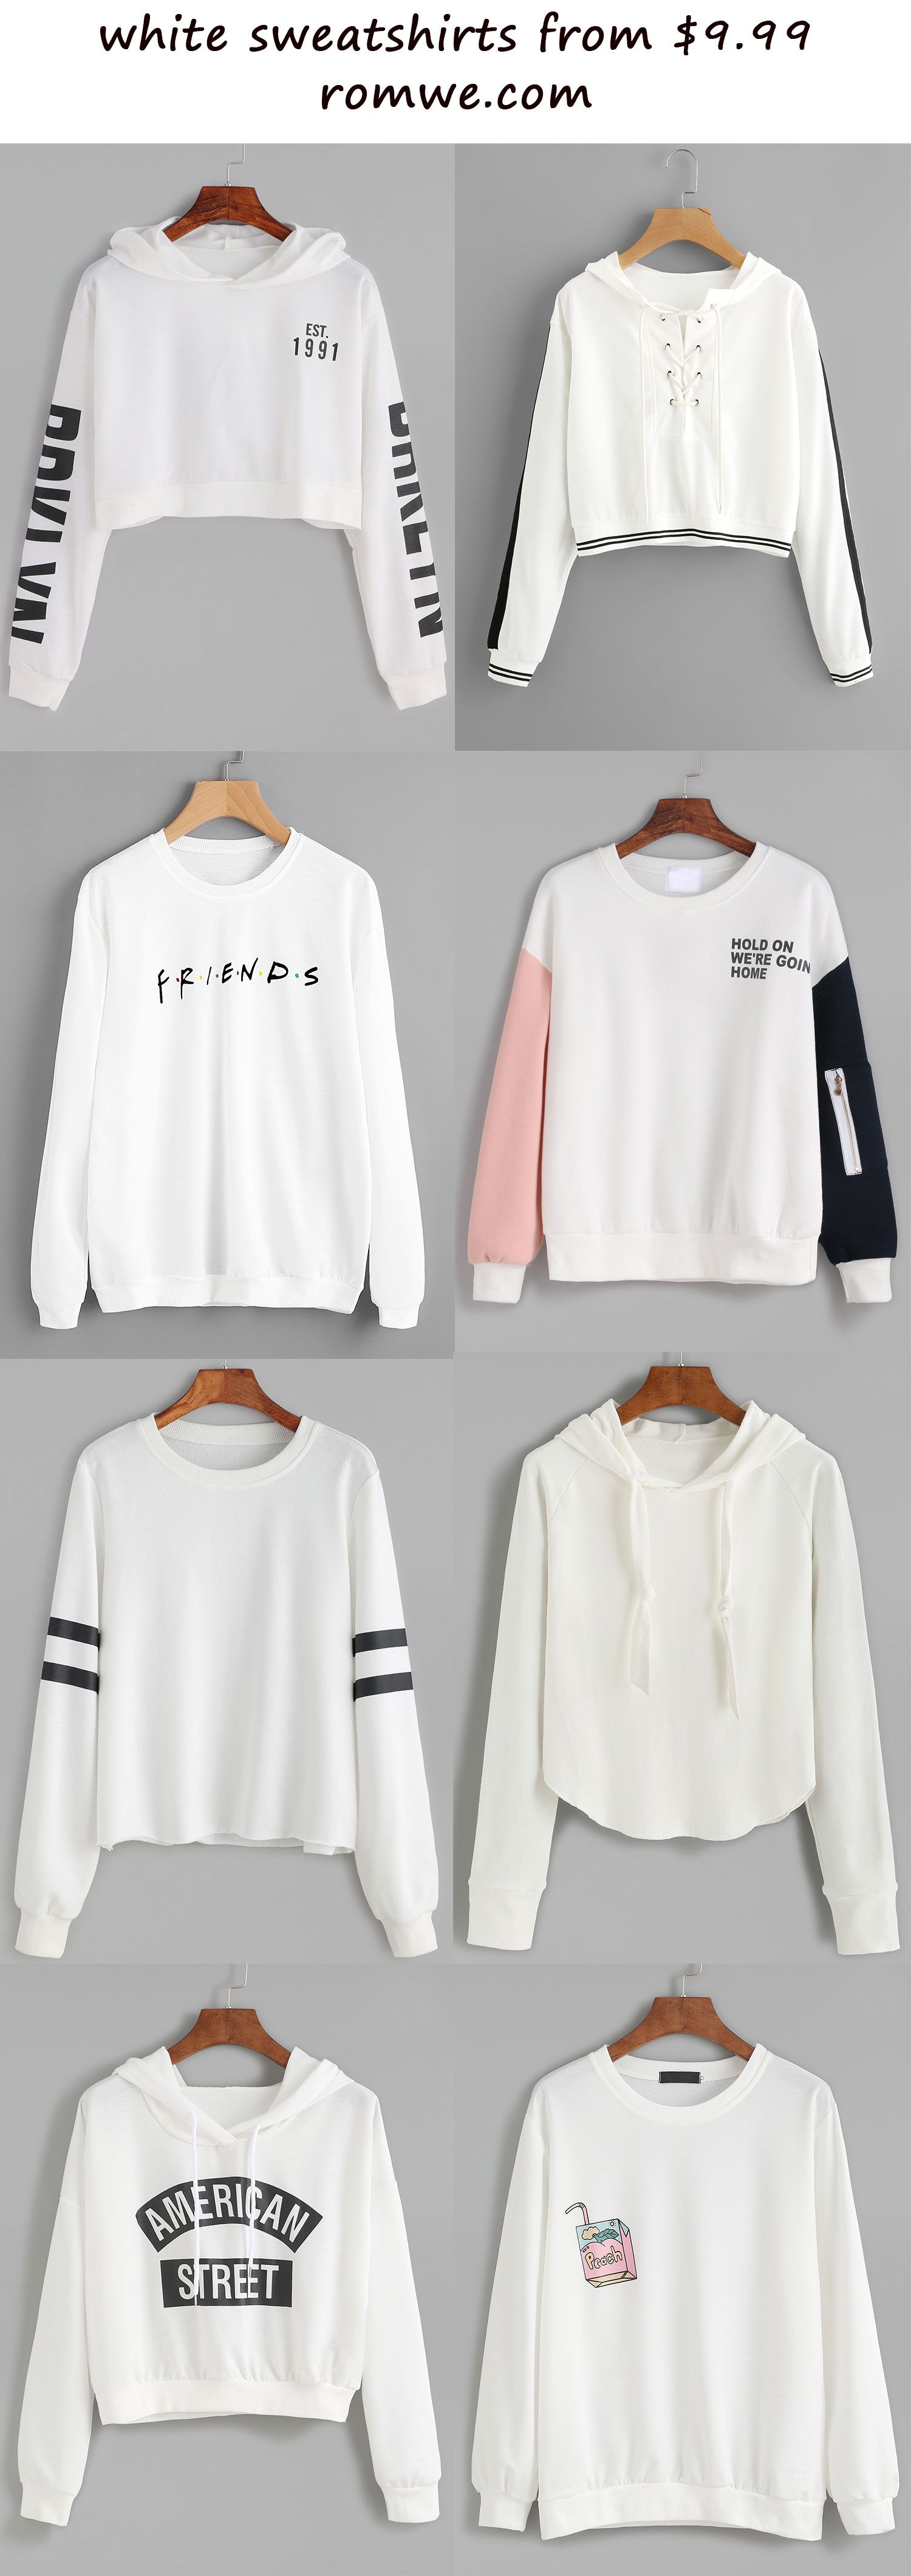 white sweatshirts 2017 - romwe.com